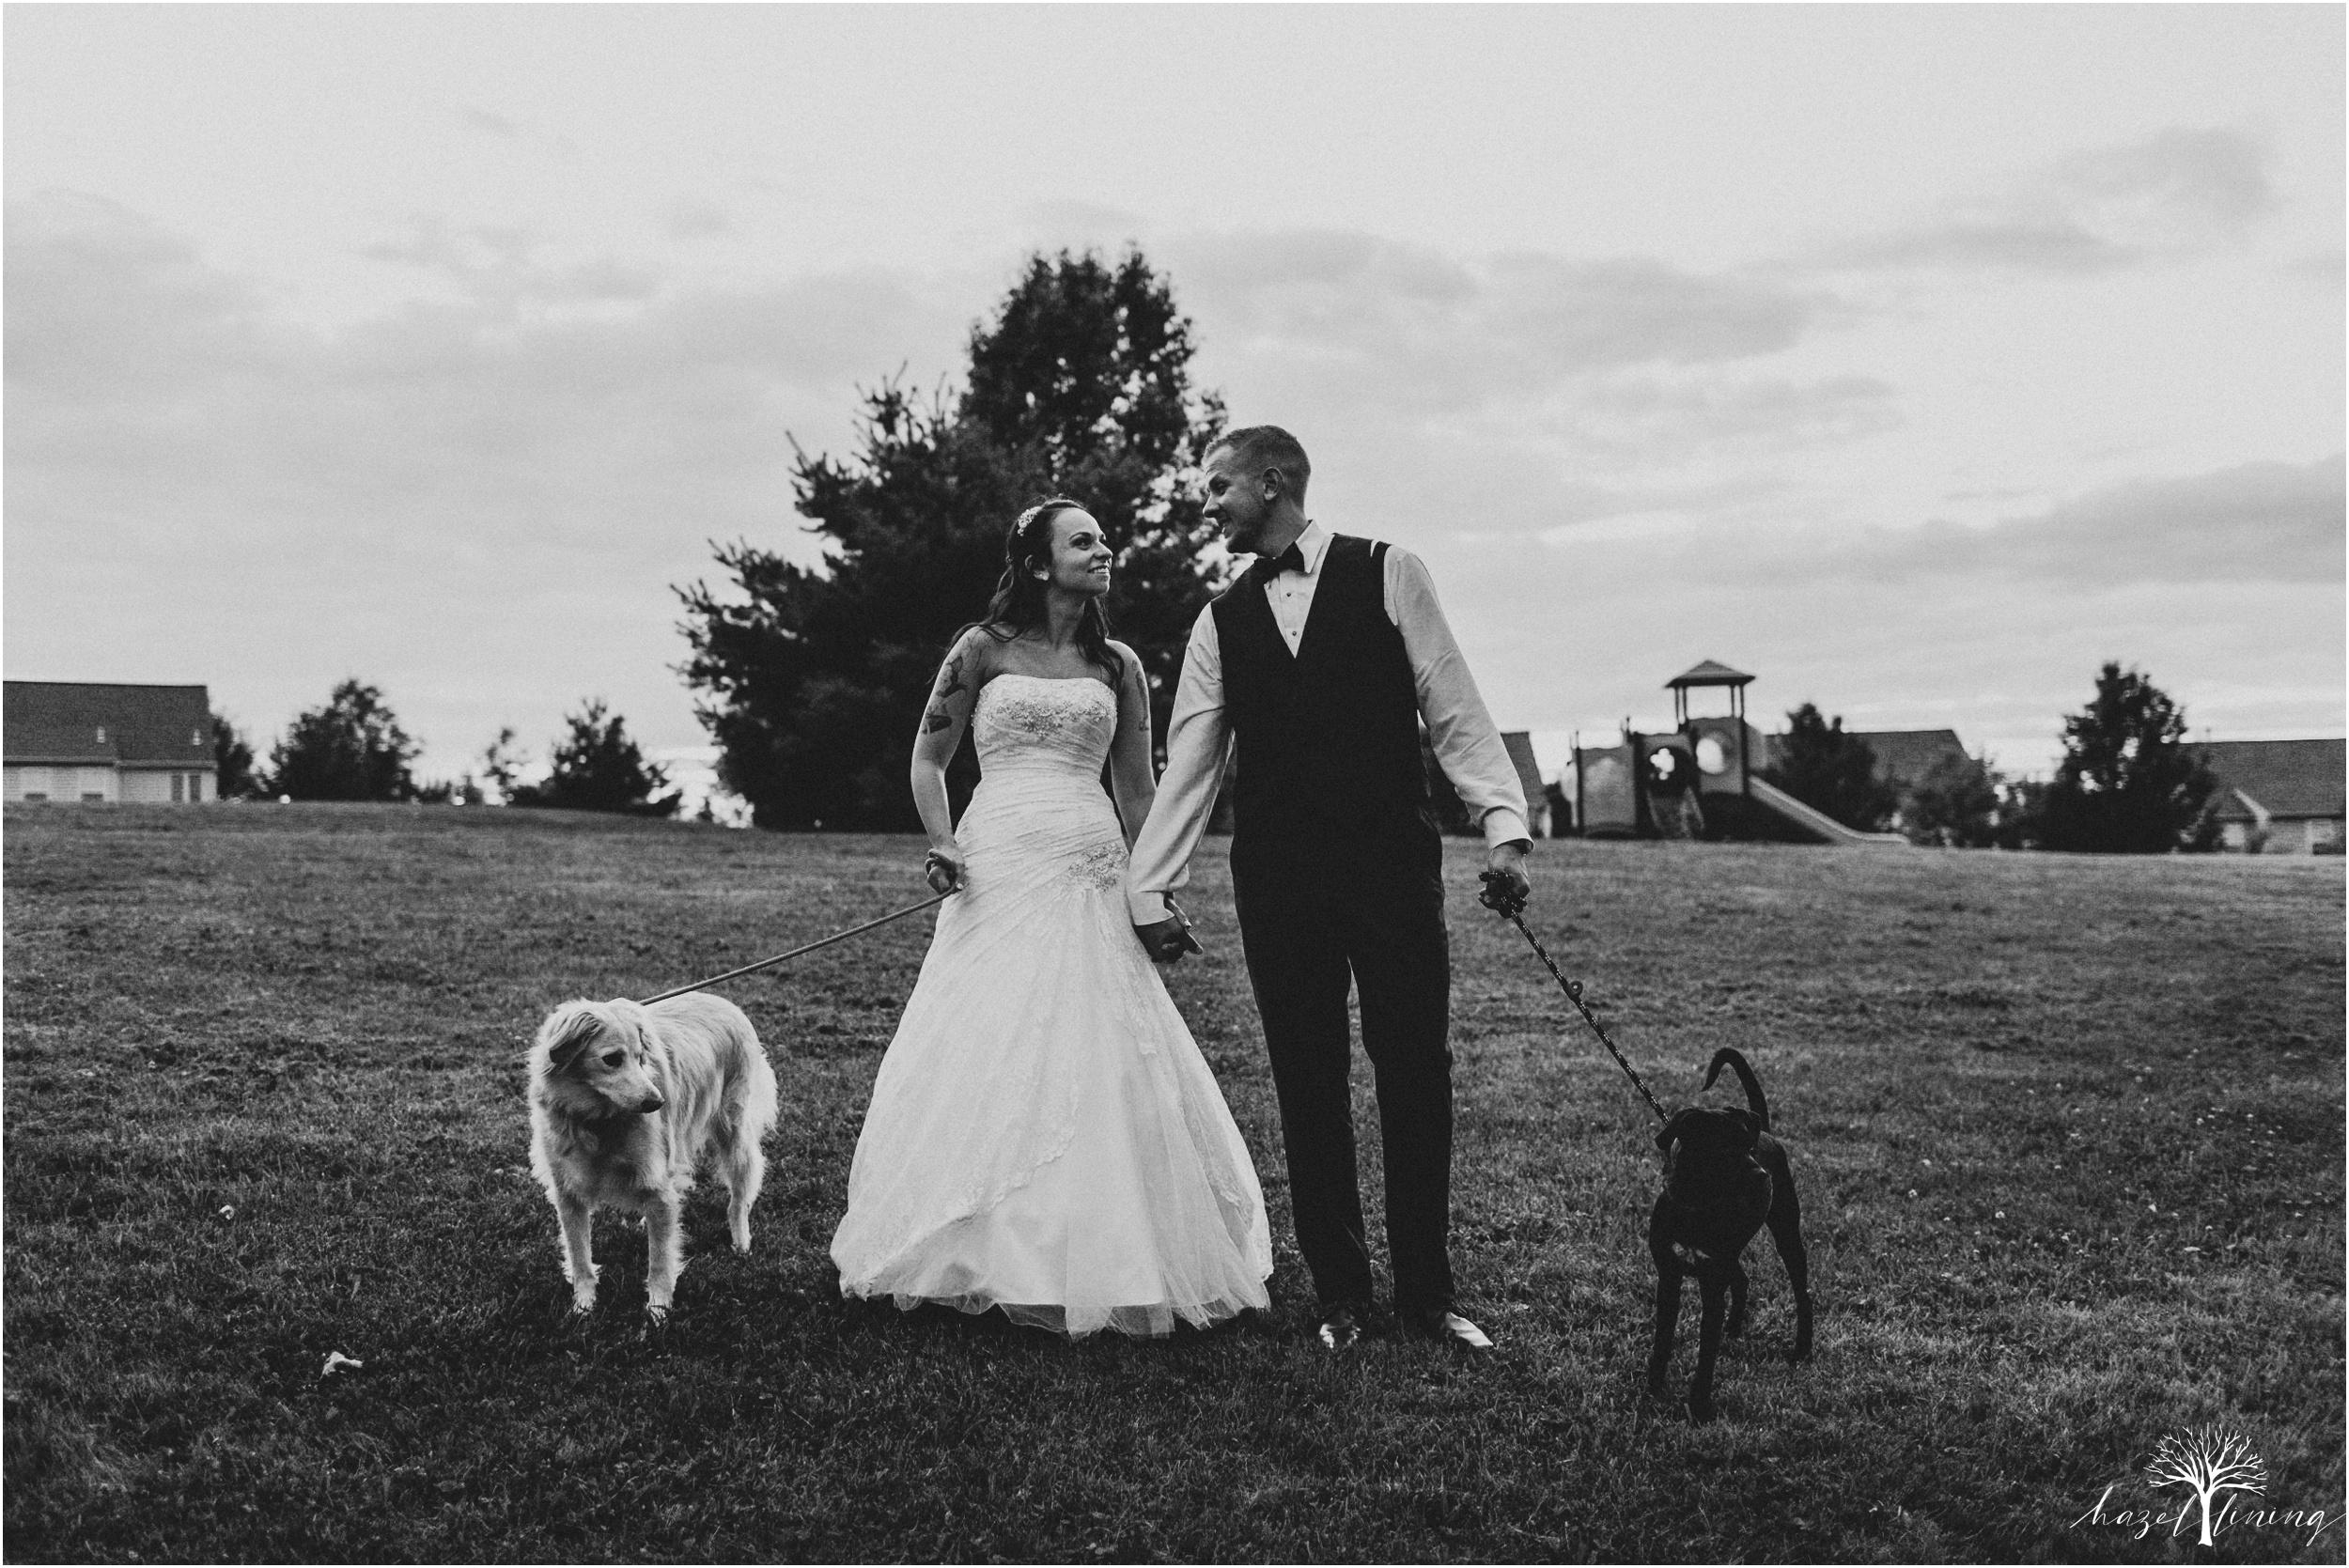 alyssa-james-stiteler-wedding-loft-and-sweet-water-cc-pennsburg-pennsylvania-hazel-lining-travel-wedding-elopement-photography_0159.jpg